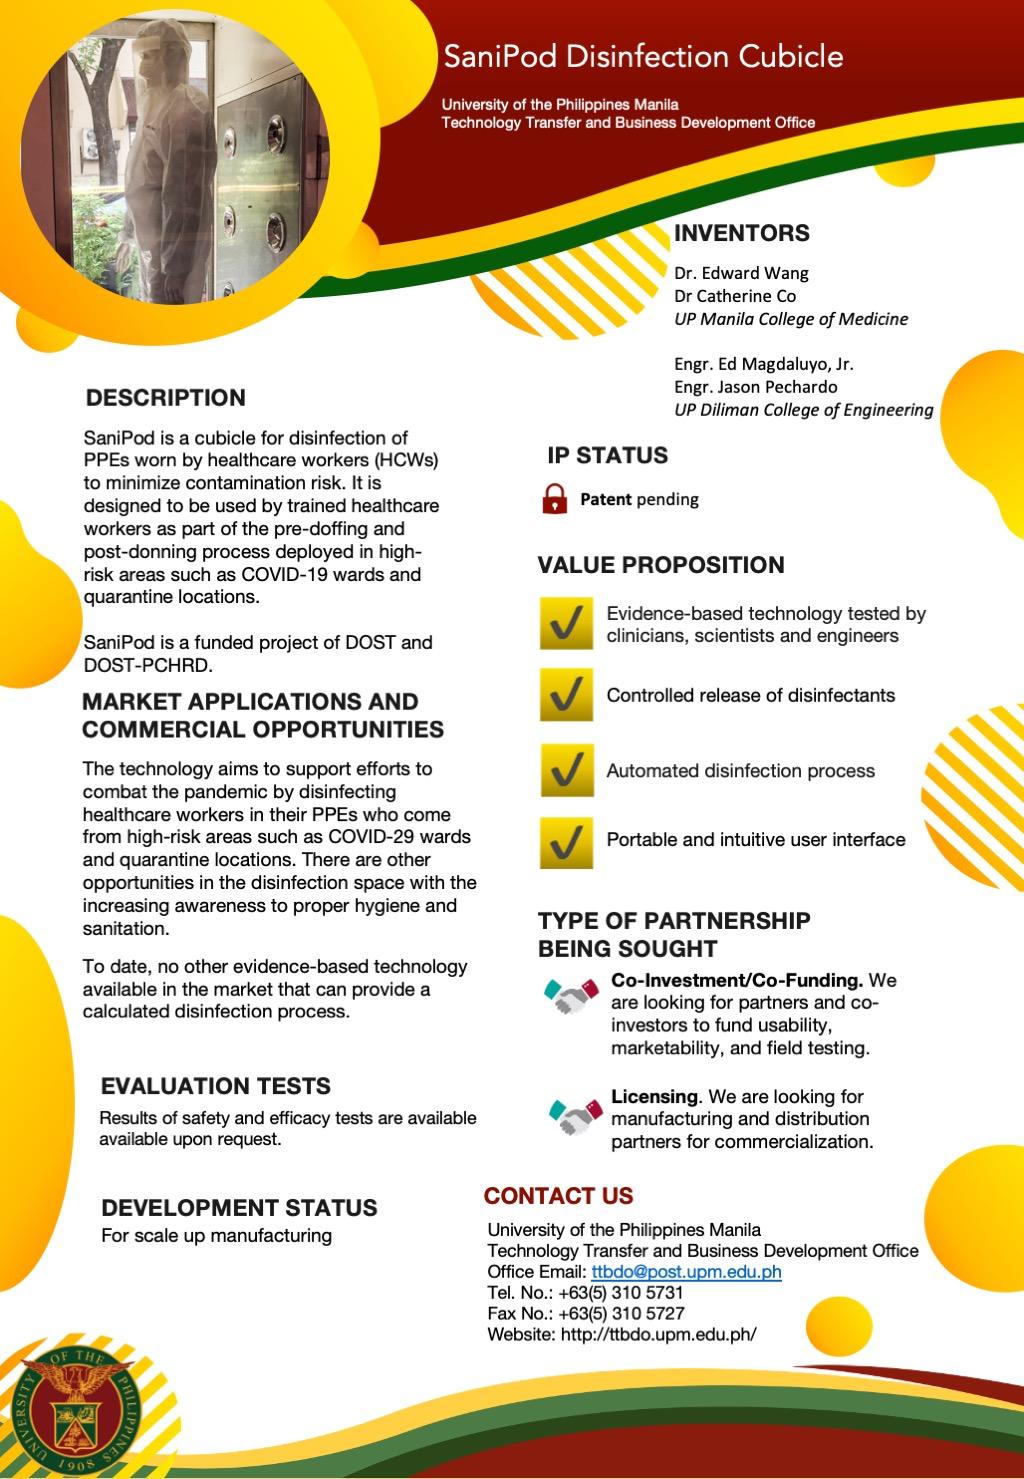 SaniPod Technology Brief